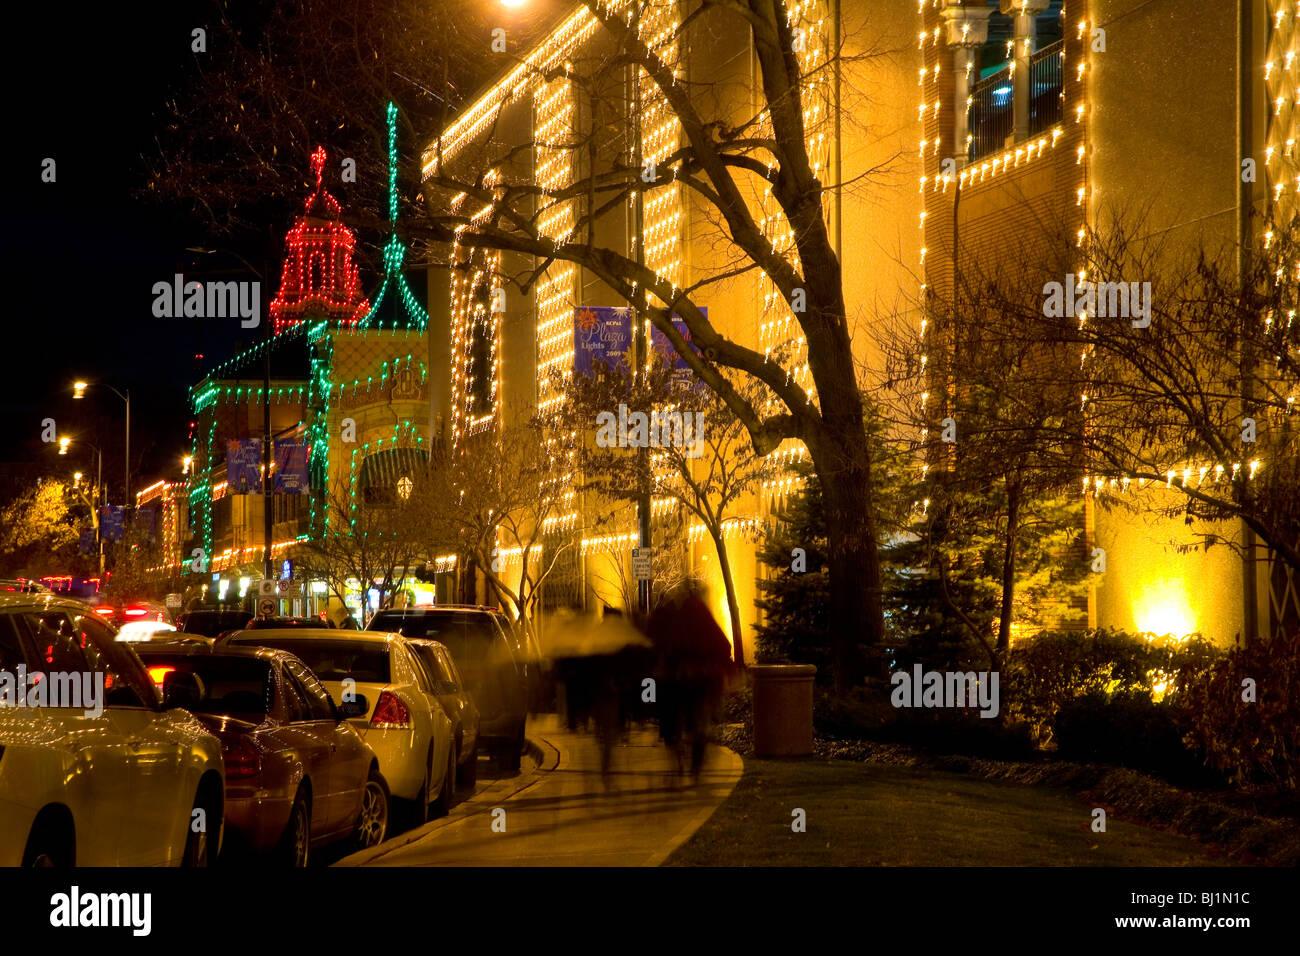 Country Club Plaza Christmas Lights in Kansas City, MO Stock Photo ...